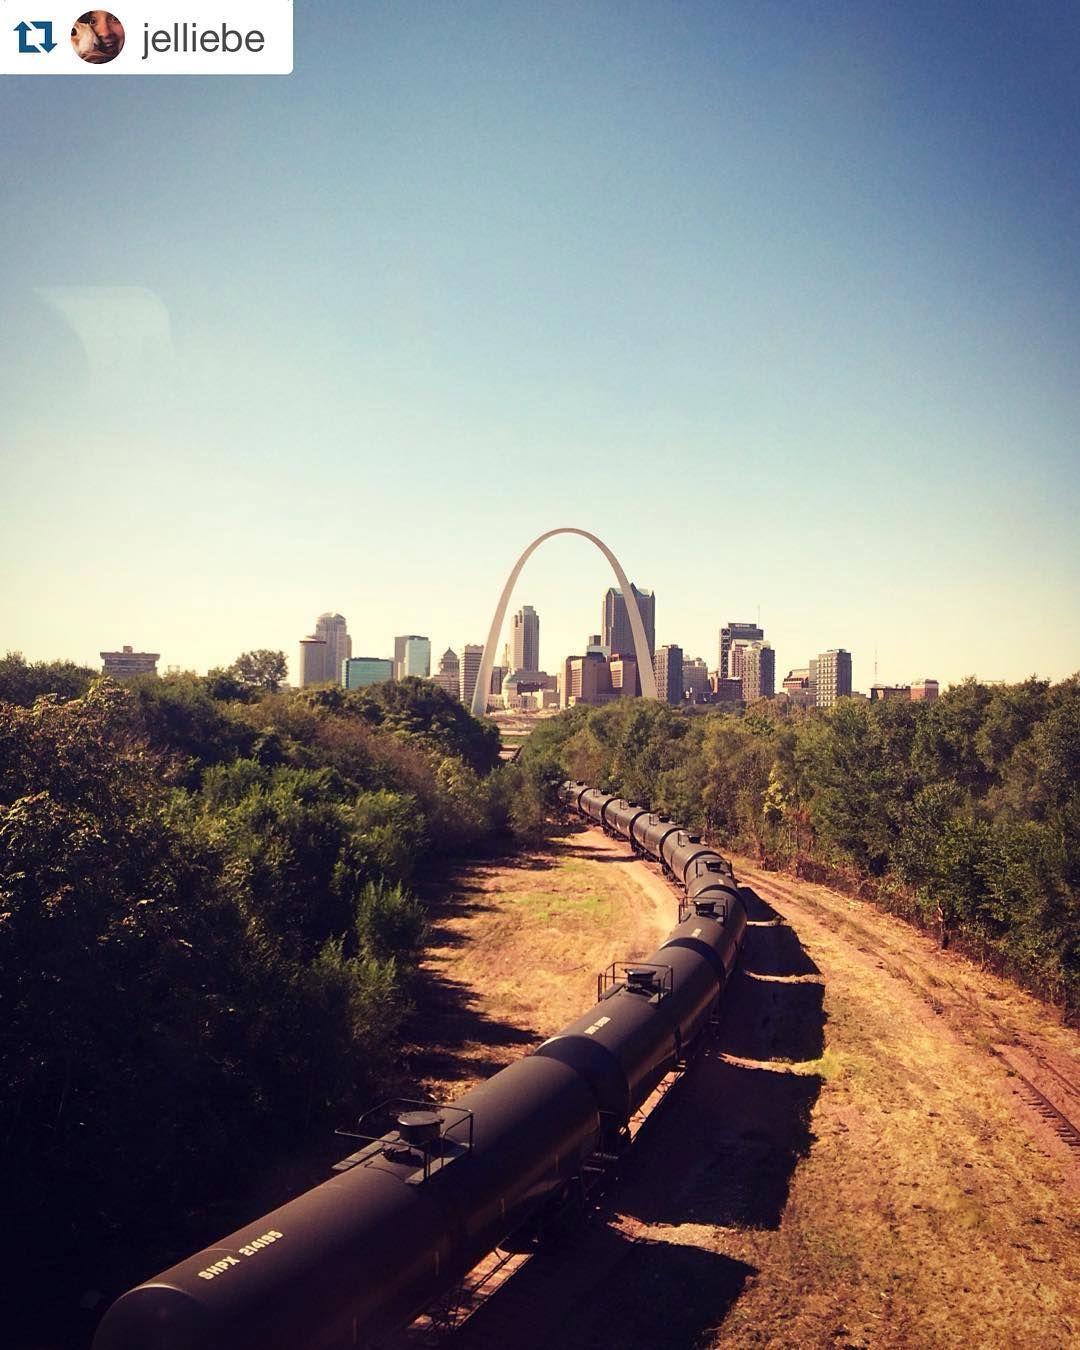 #Repost @jelliebe  The gateway to the Midwest   #stlouis #stl #amtrak #arch #midwest #getaway #instatravel #missouri #home #gateway #smalltravels #merica